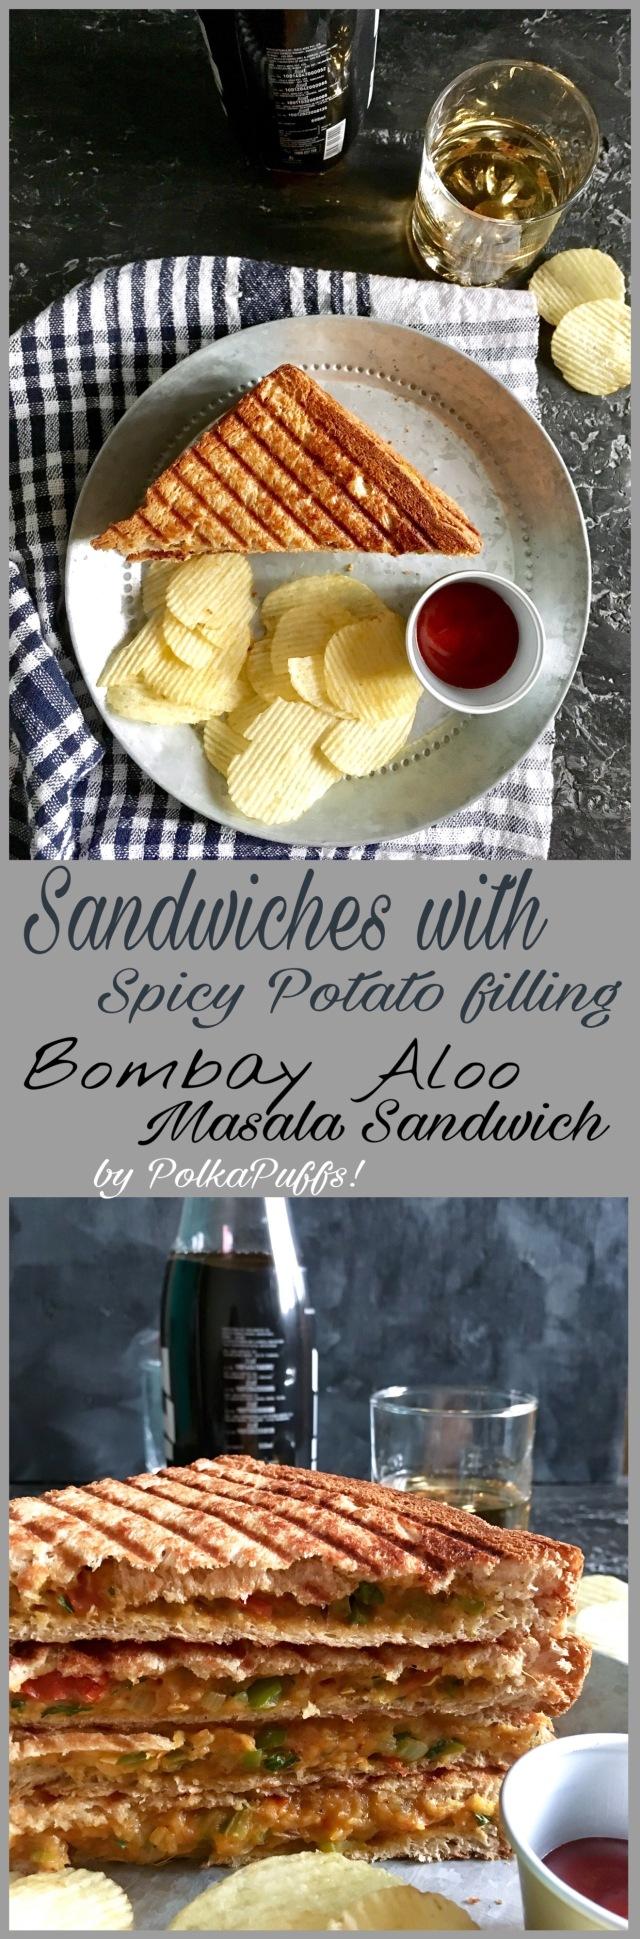 Bombay Aloo Masala Sandwich.